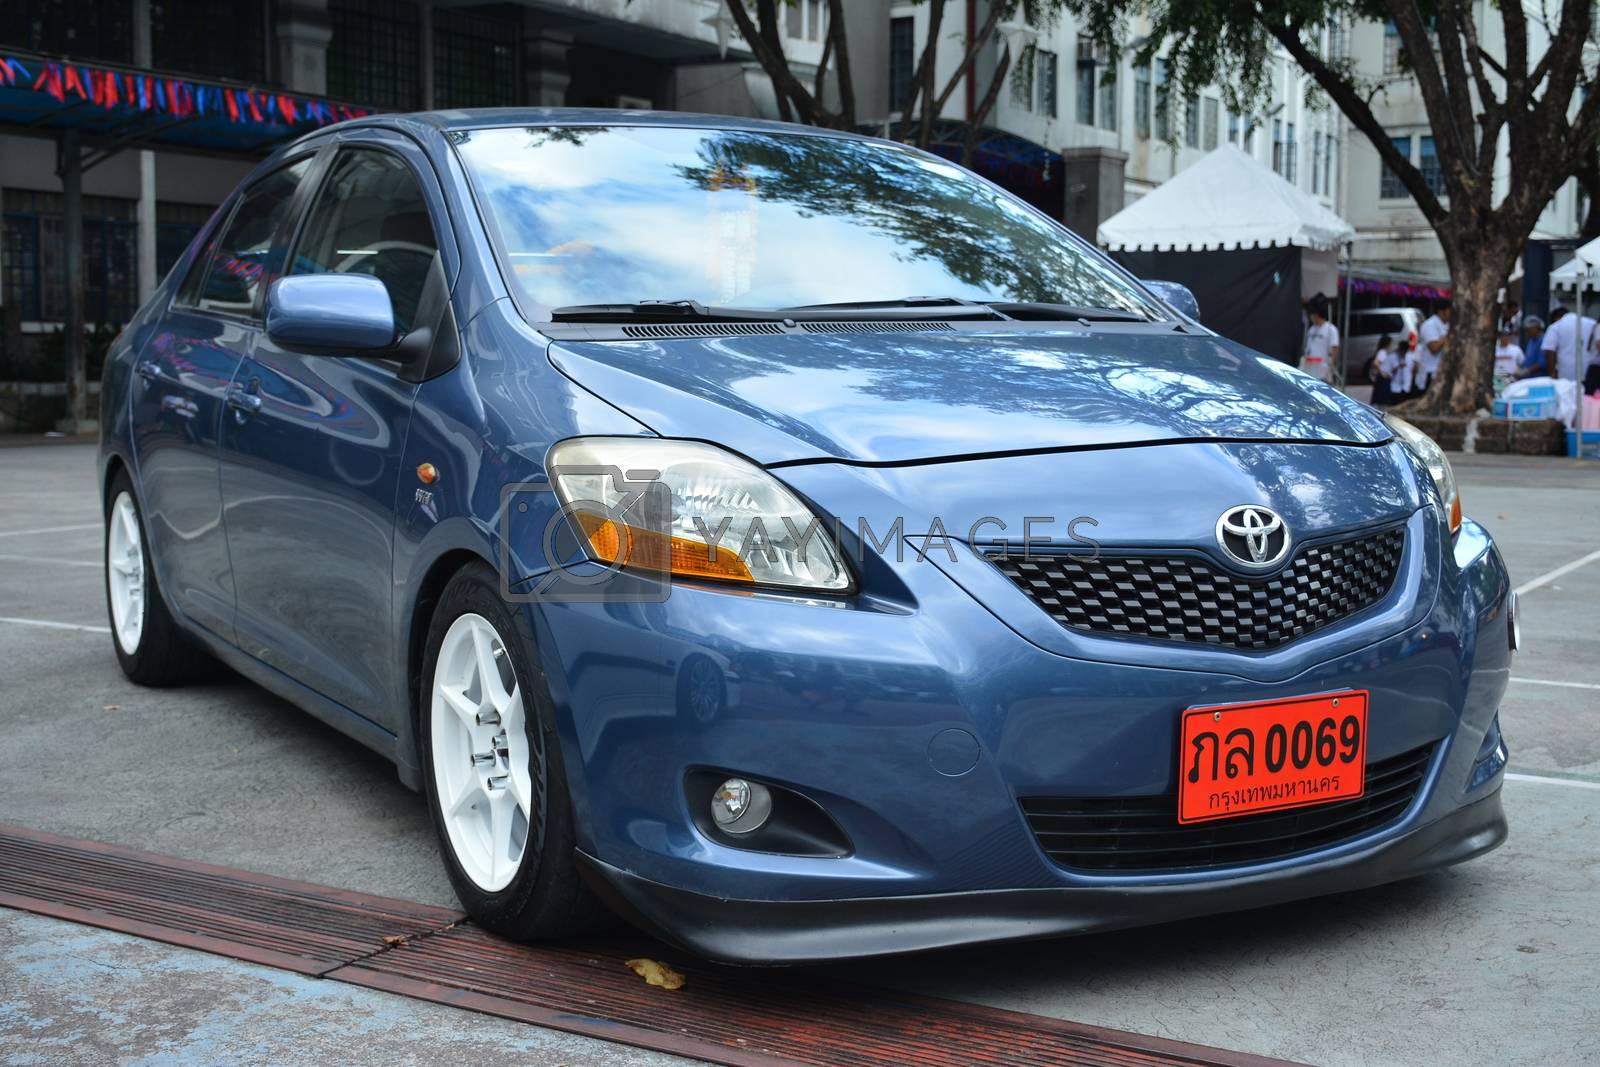 MANILA, PH - NOVEMBER 10 - Toyota vios at Transknight transport show on November 10, 2018 in Manila, Philippines.